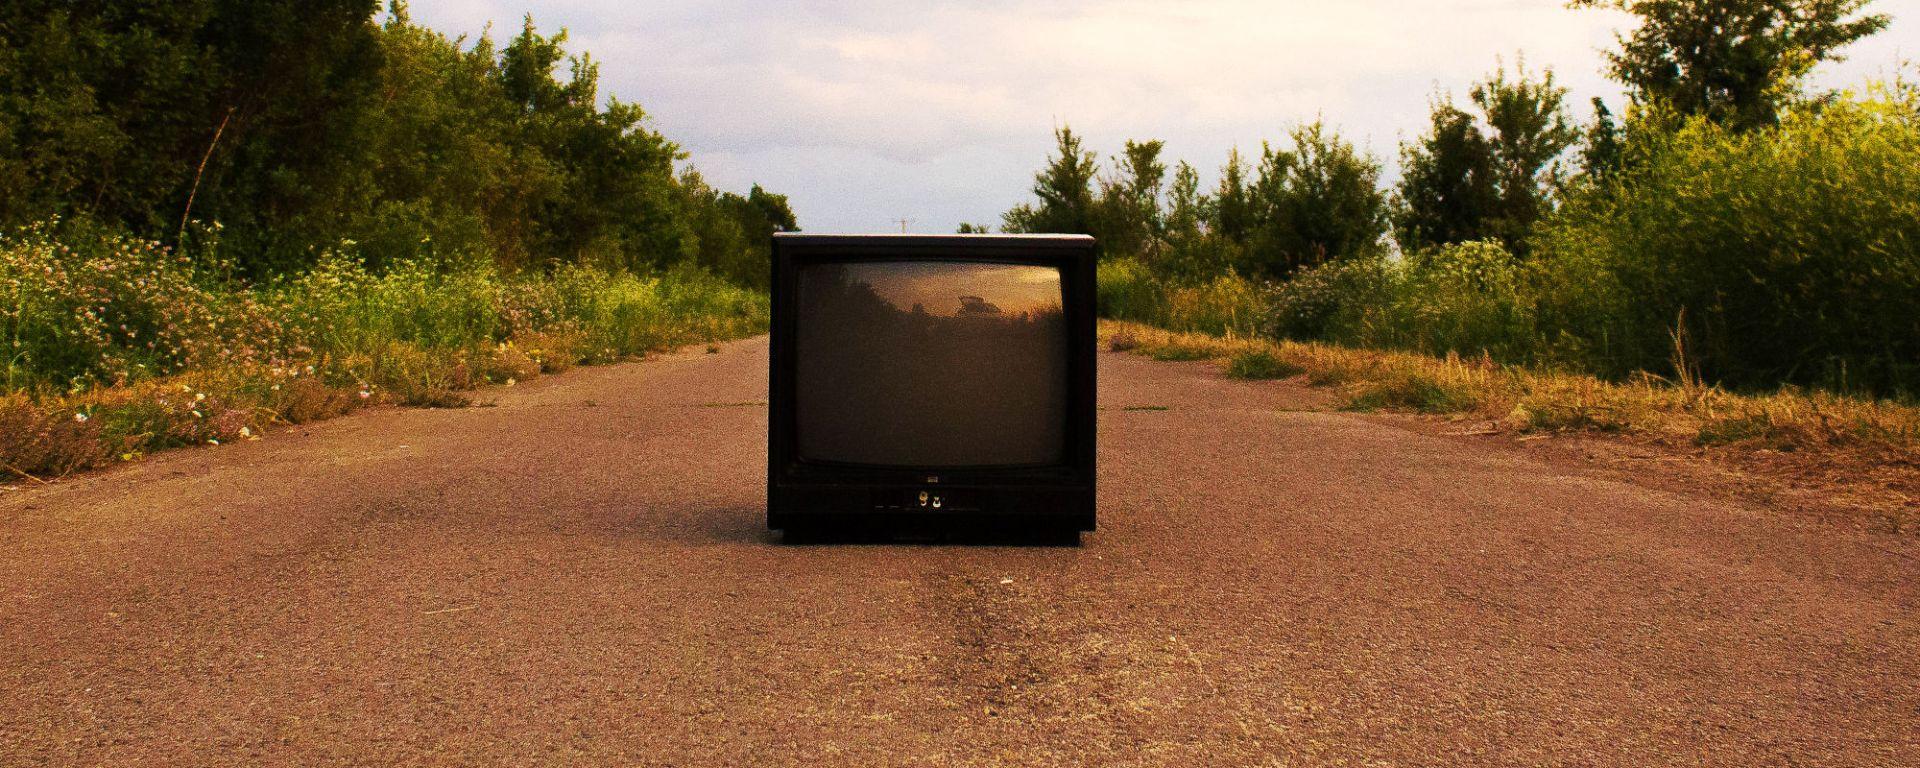 Media Representation Television